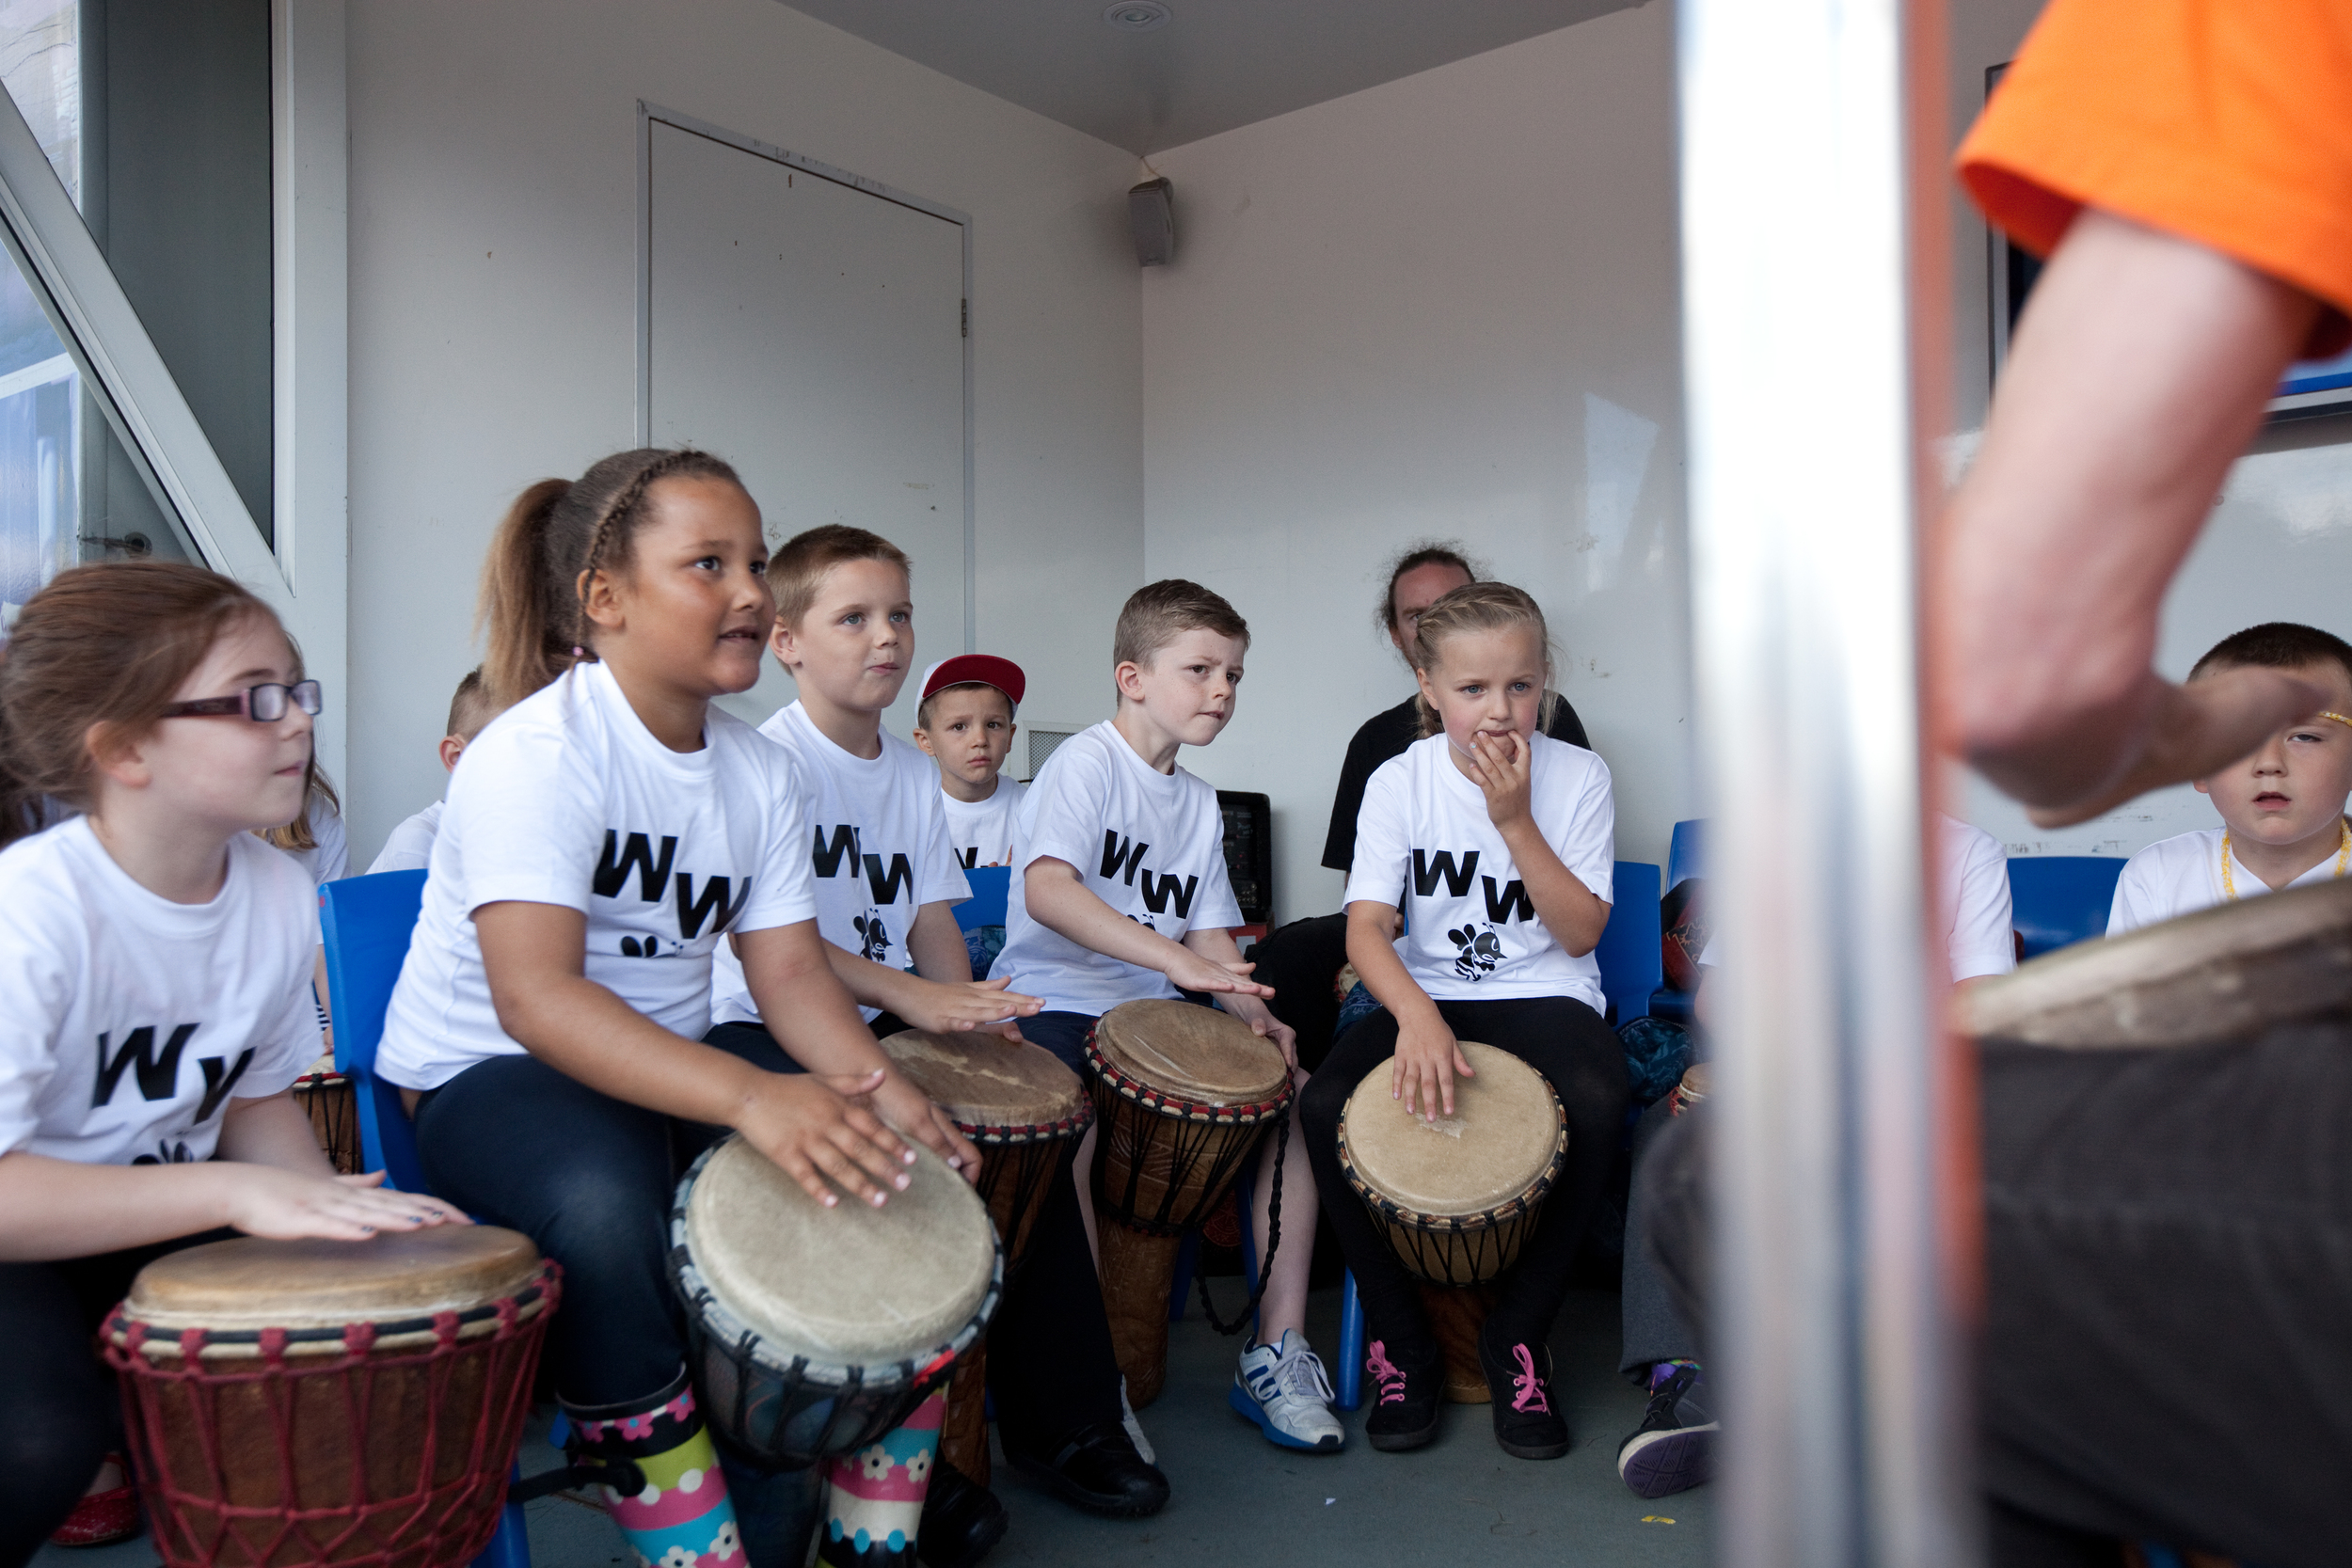 Children's drumming performance, Wincobank, Sheffield